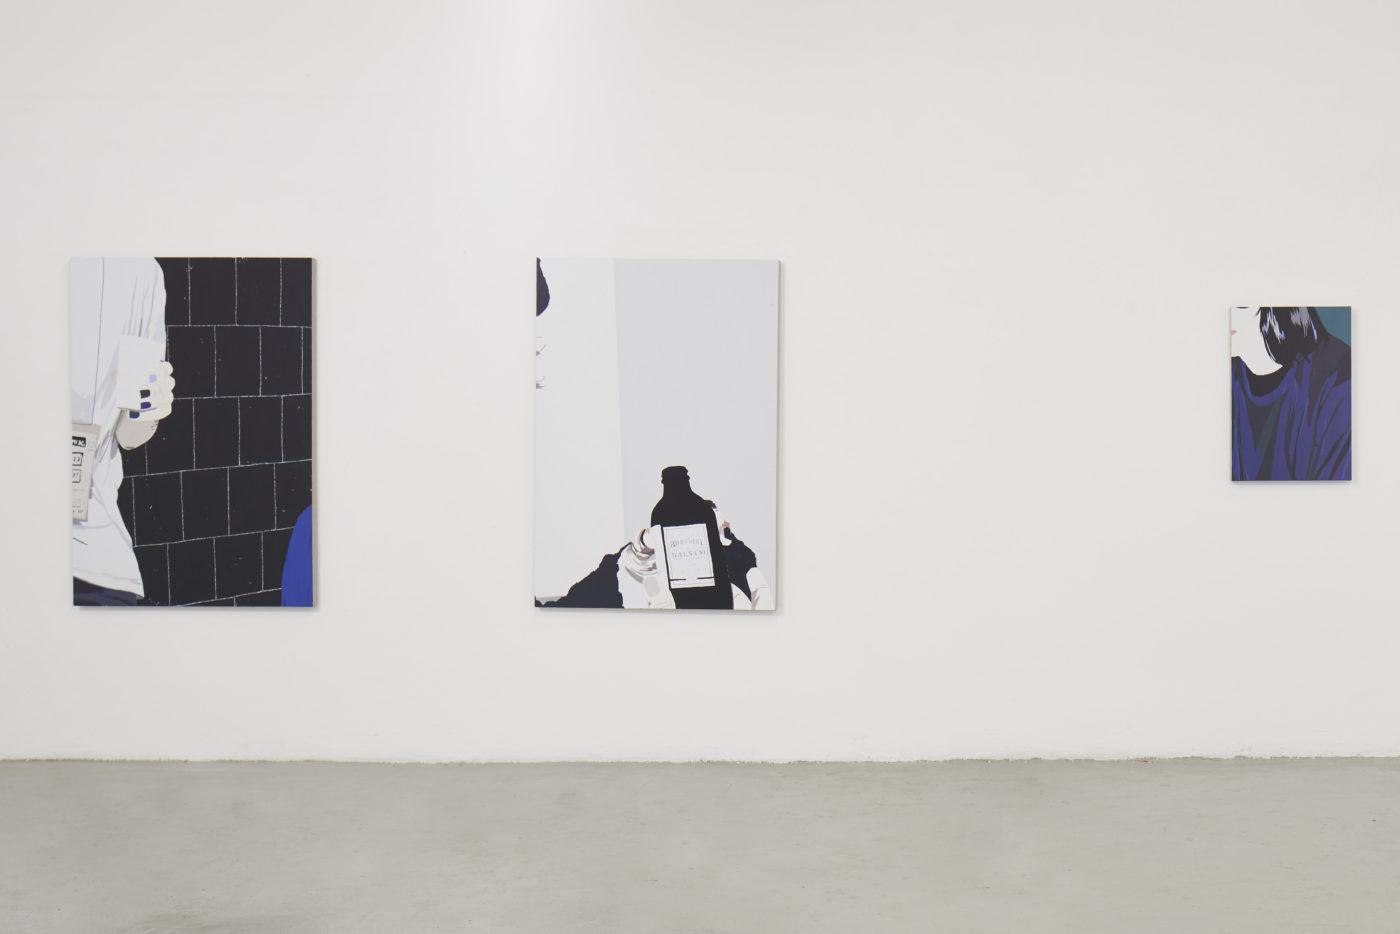 Michael Bevilacqua, Andrea Carpita - In my room. The Flat - Massimo Carasi